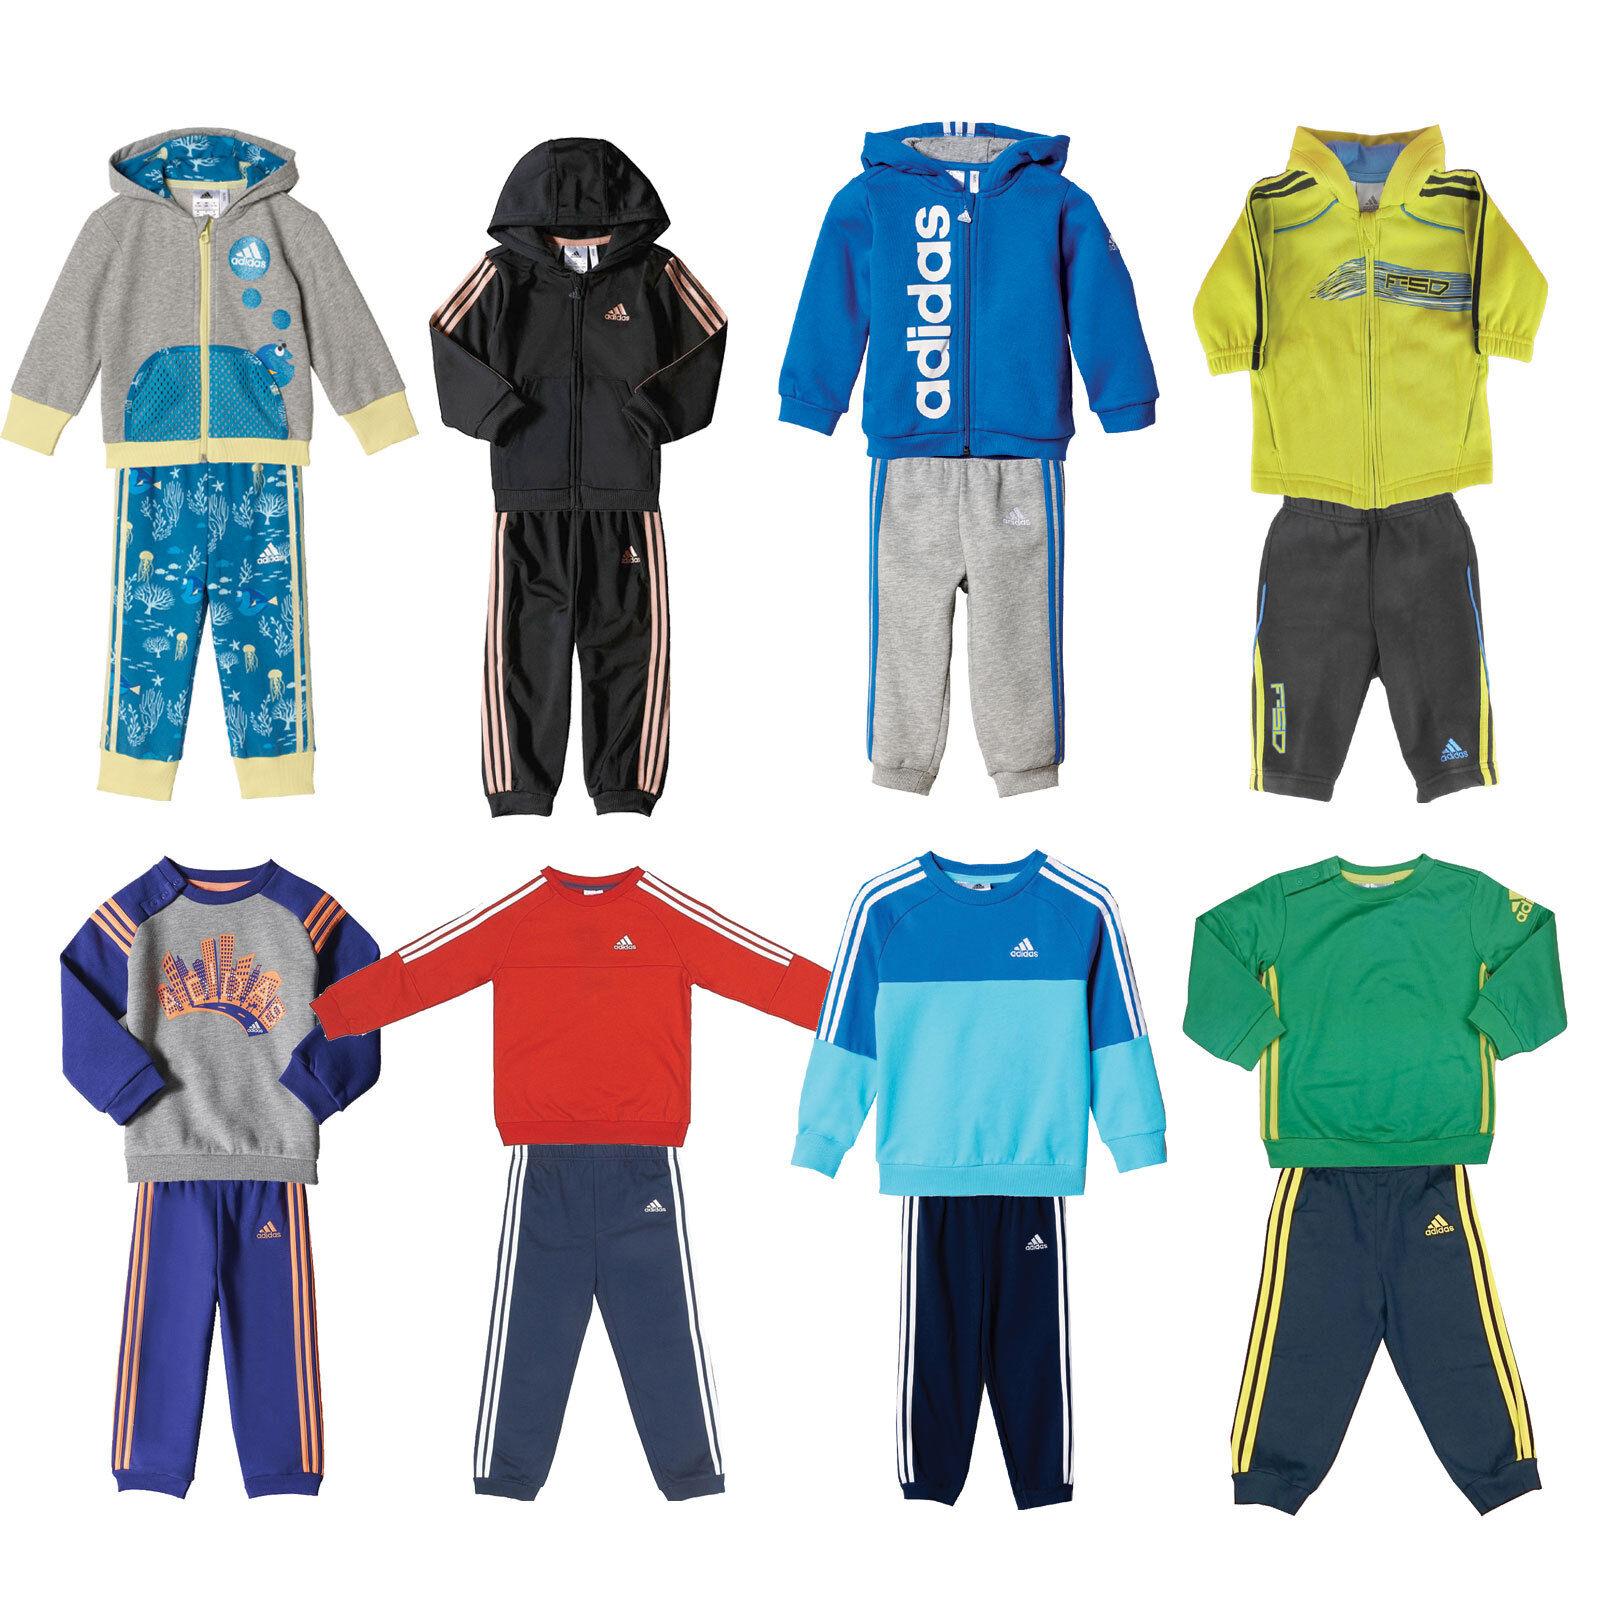 adidas Performance Jungen Baby Trainingsanzug NEU Kinder & Jugend Bekleidung